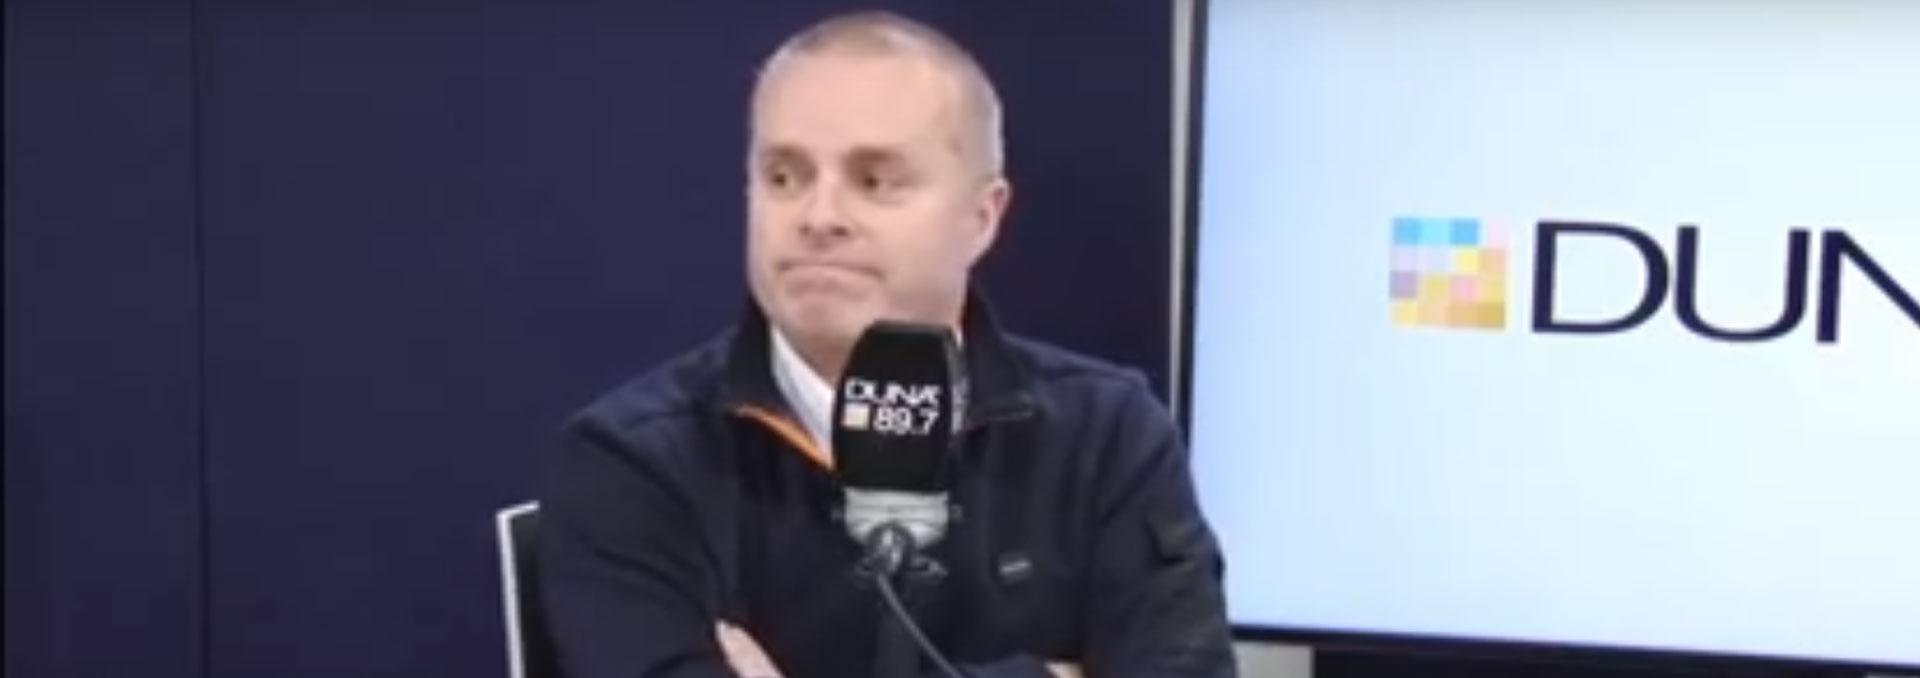 Radio Duna interview with Dr. Hernán González.